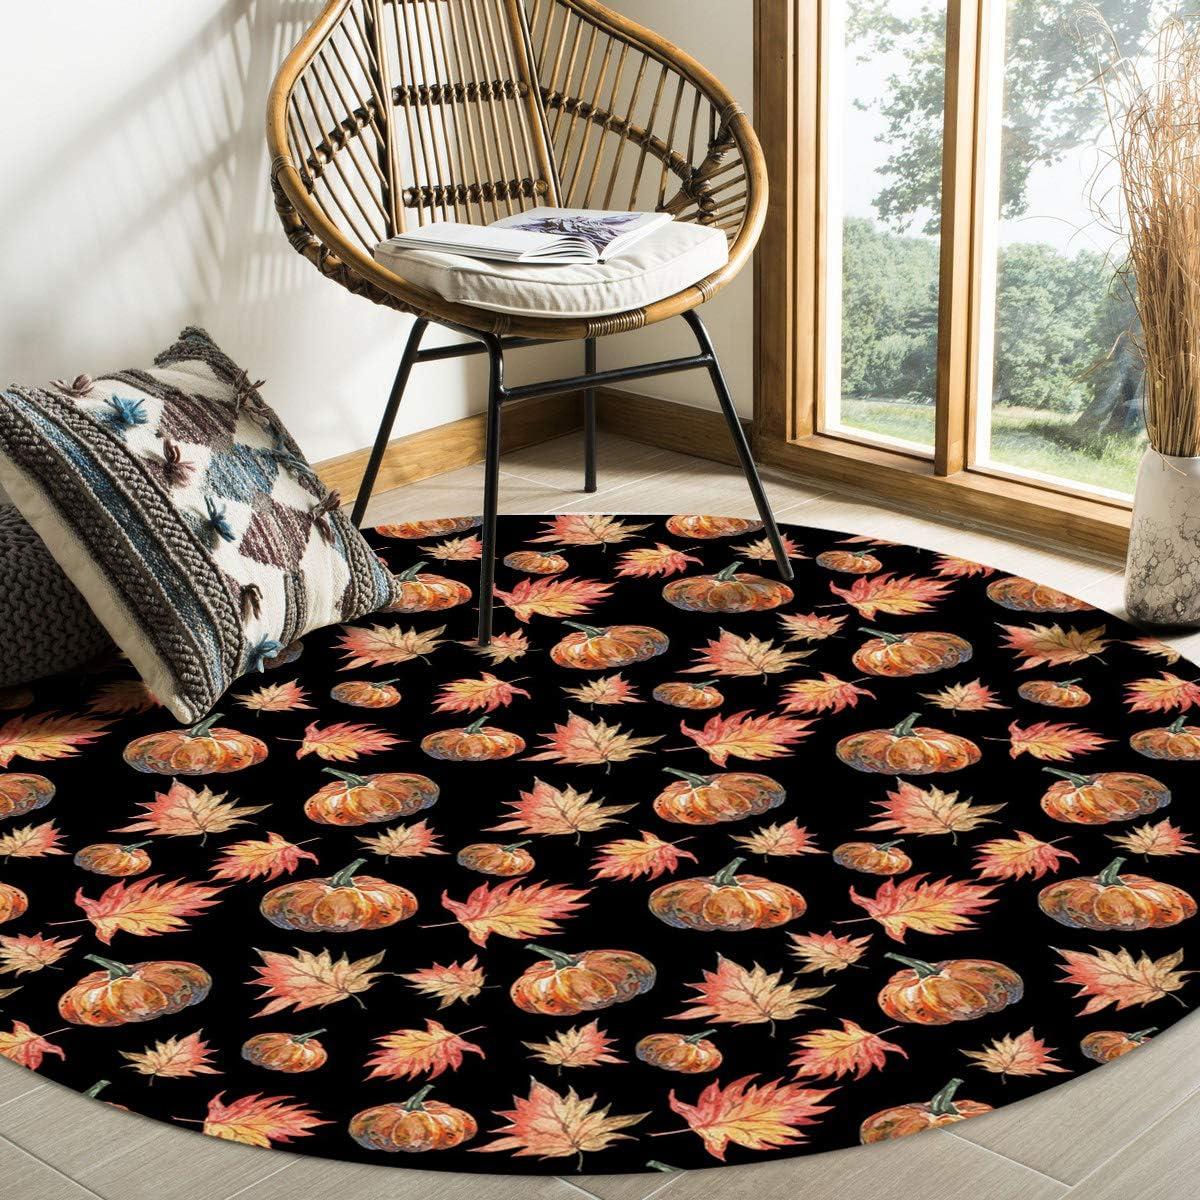 Womenfocus Inventory cleanup selling sale 4 Ft Round Soft Carpet Kids En Non-Shedding Girls for OFFer